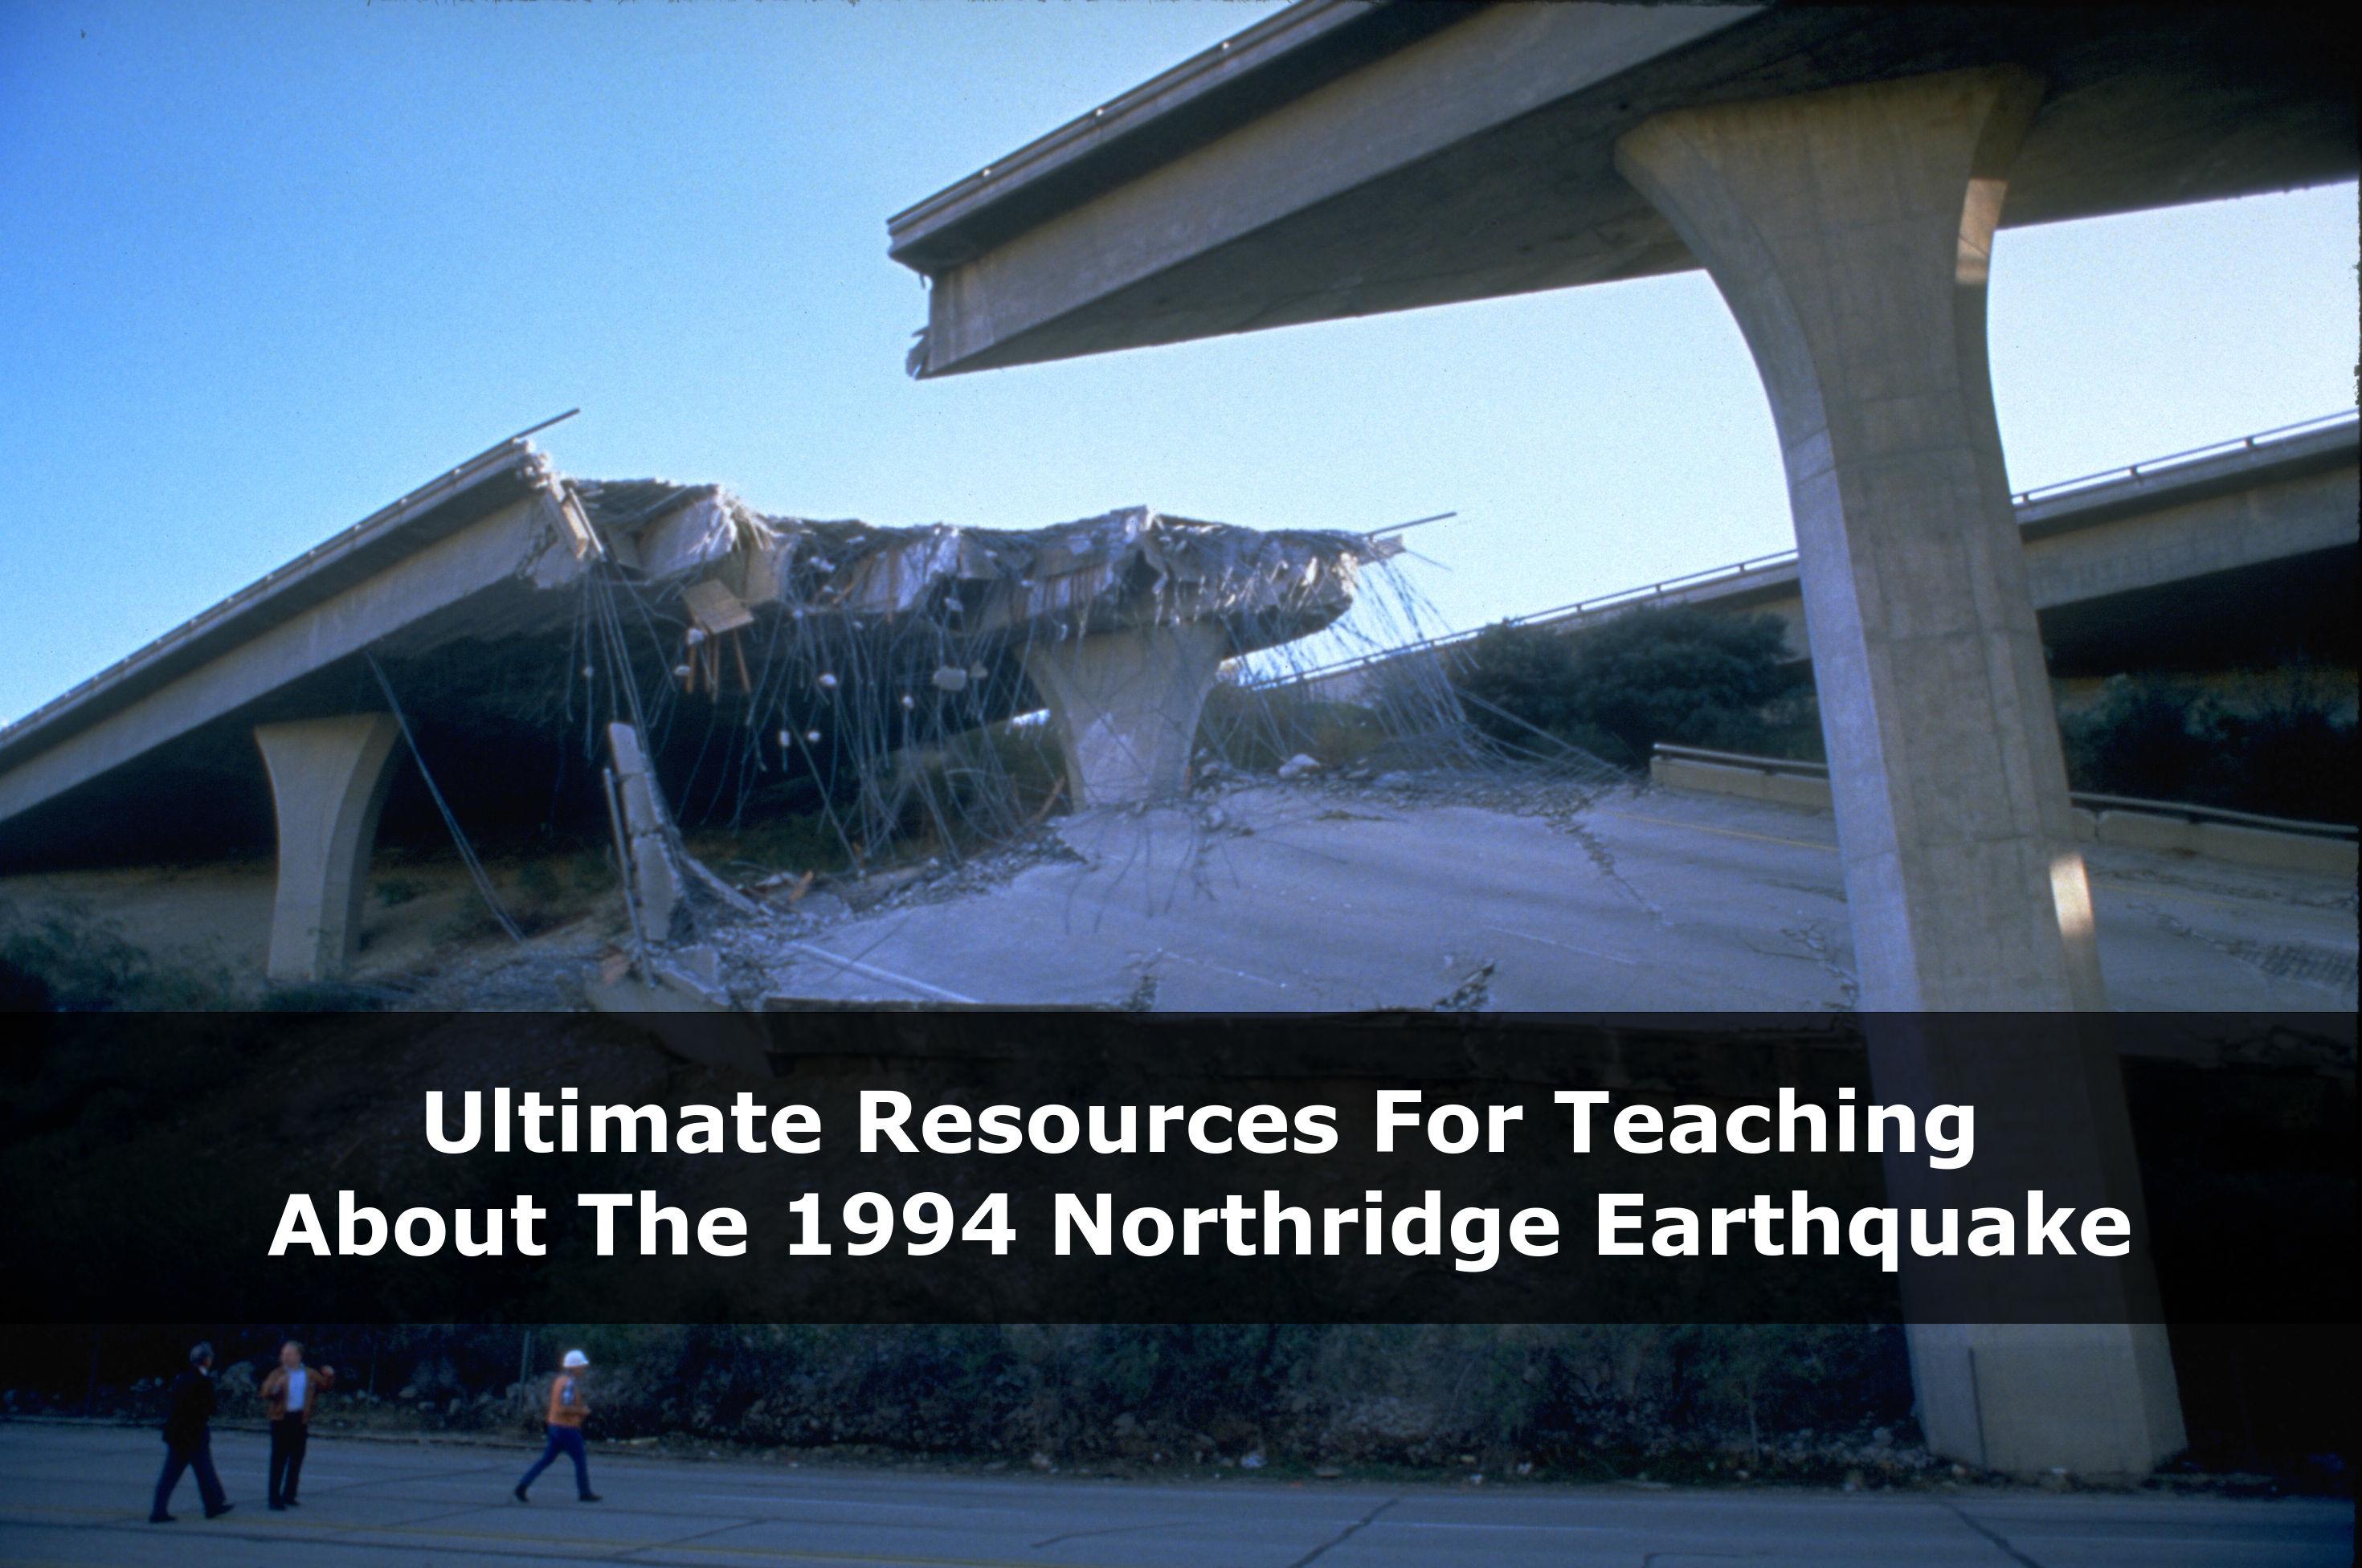 descriptive essay on earthquakes